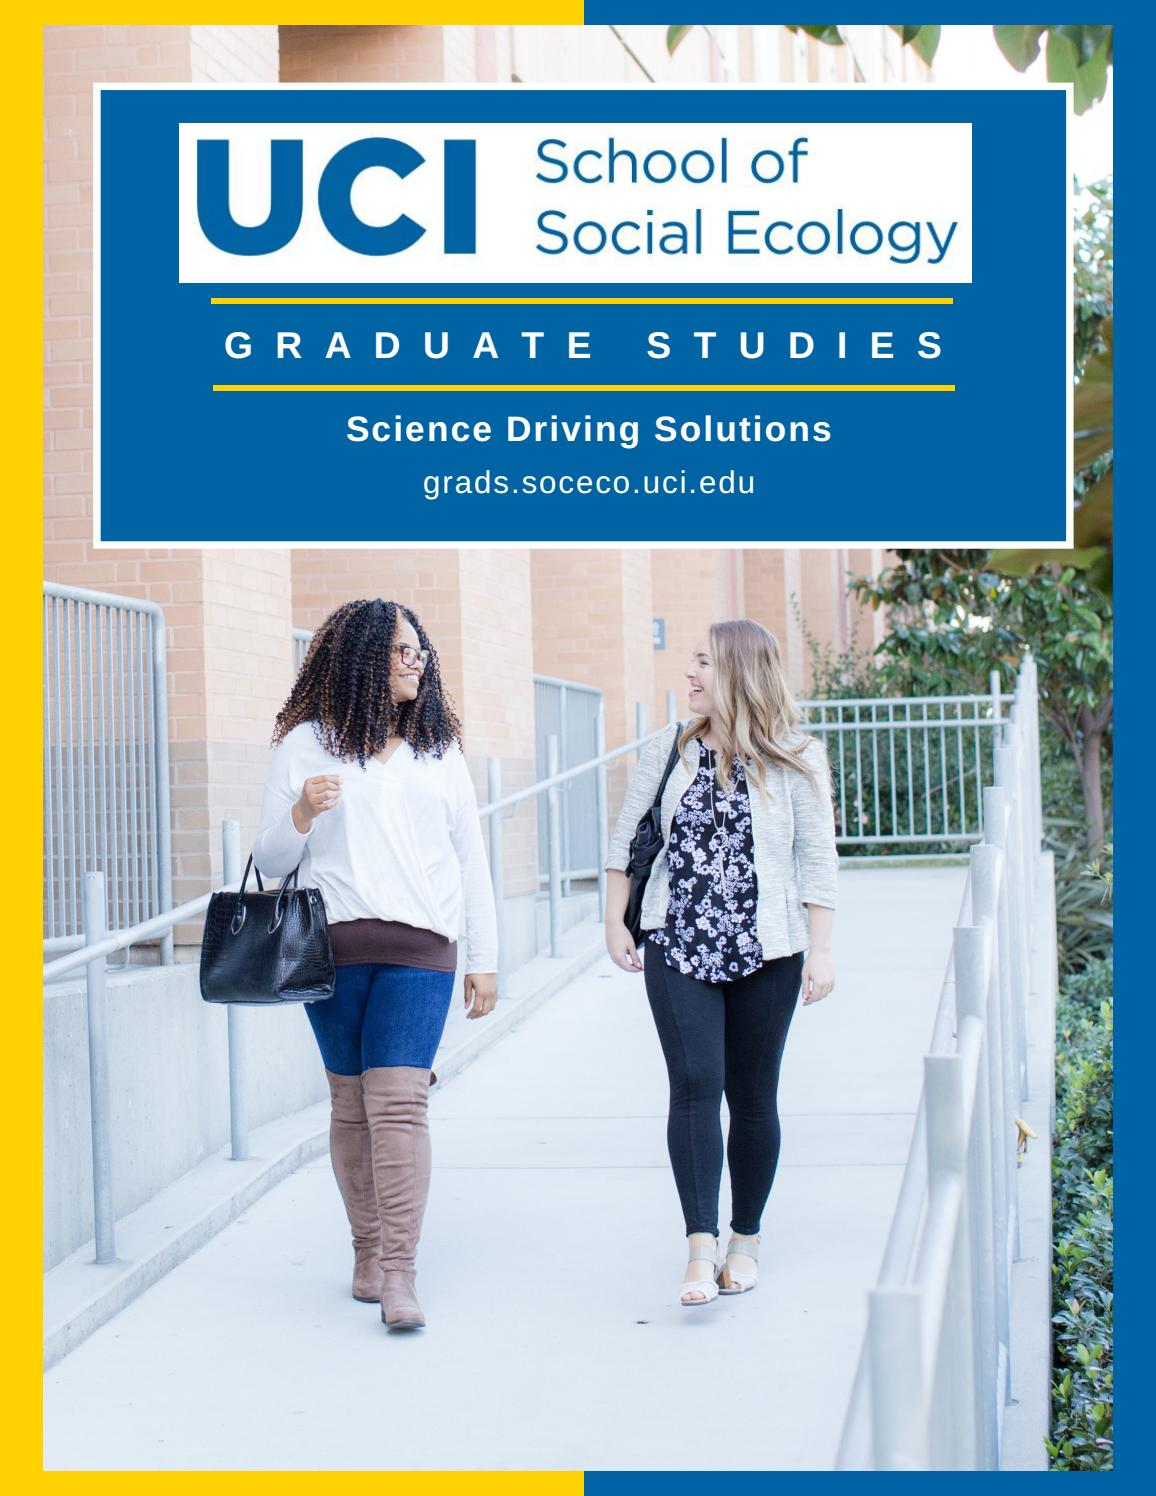 Uci Graduation 2020.Uci Social Ecology Graduate Studies 2020 By University Of